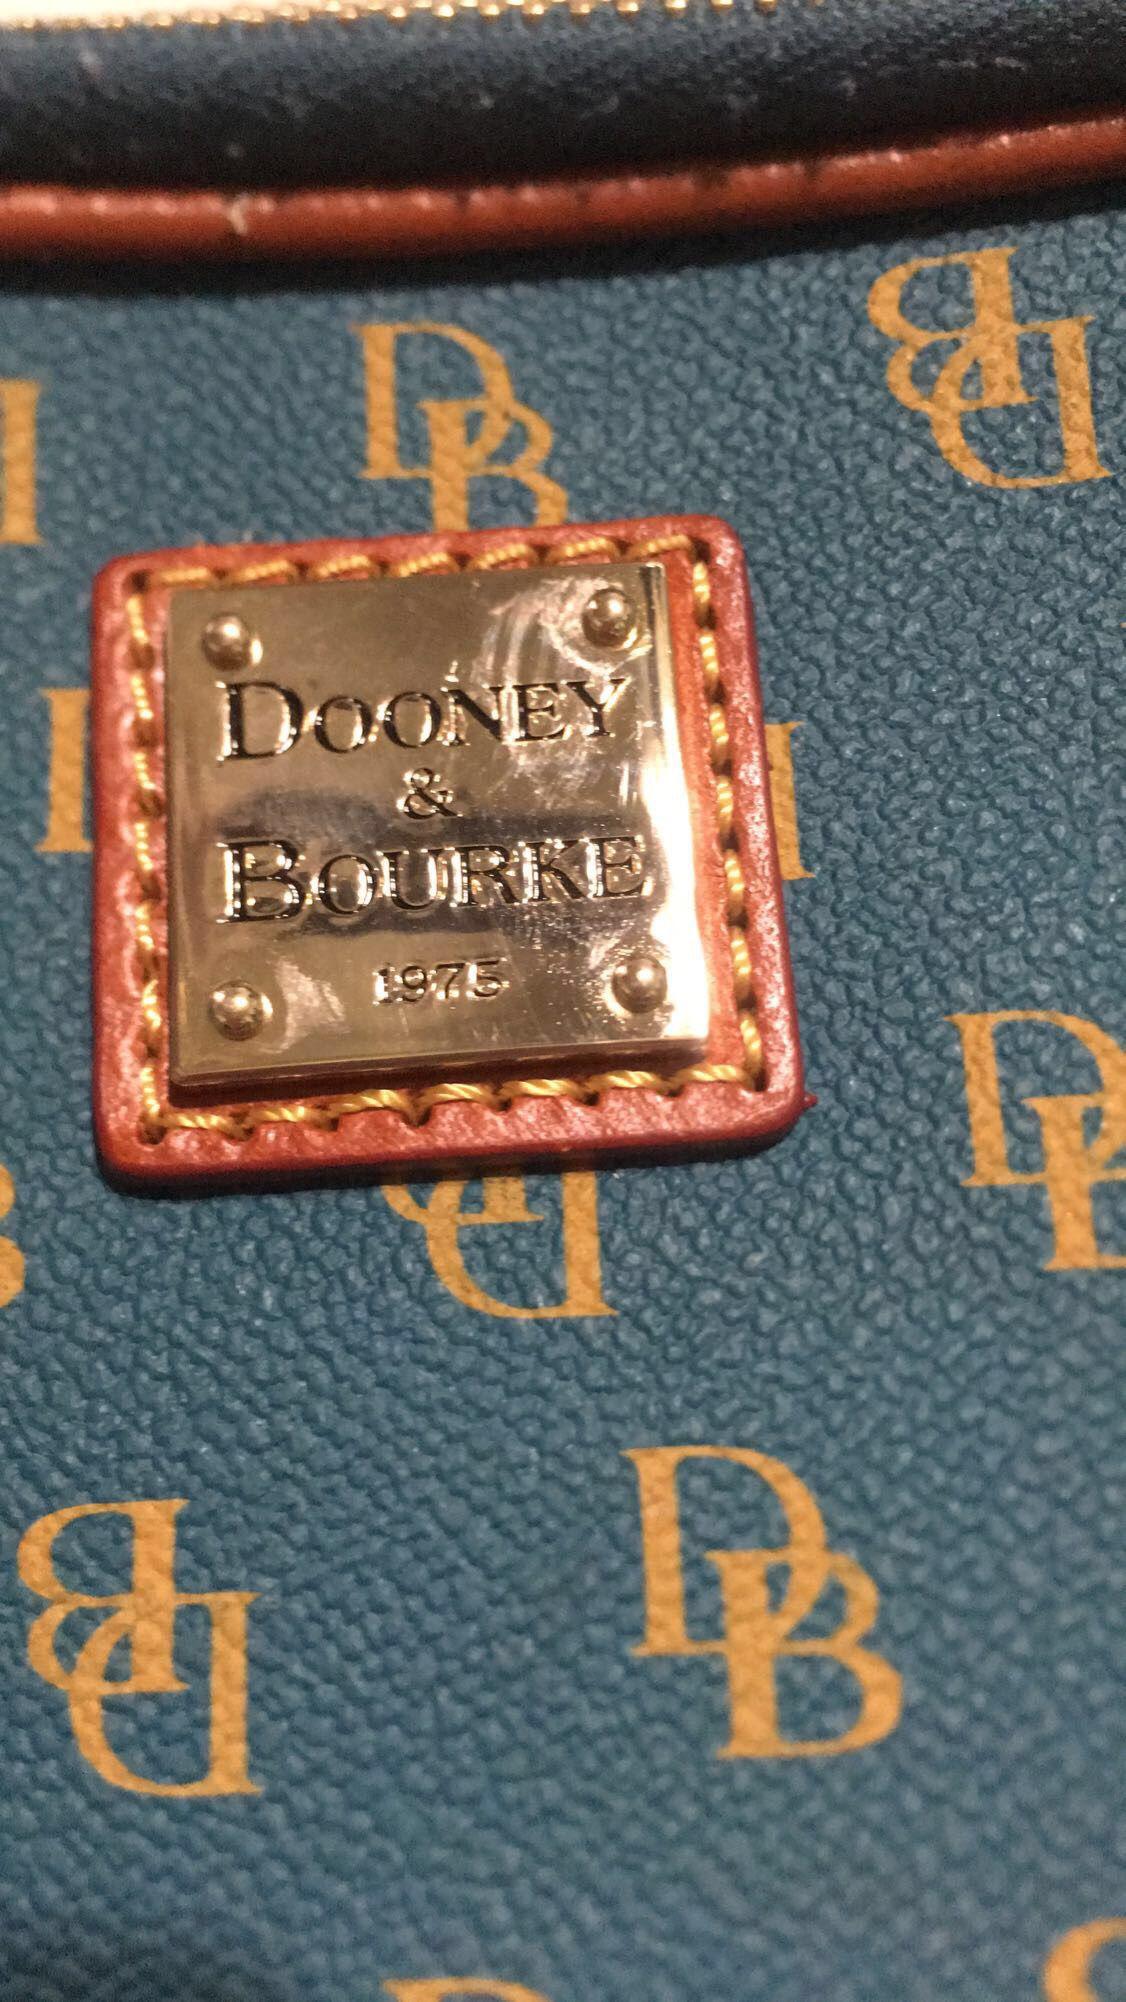 Dooney & Bourke Purse small